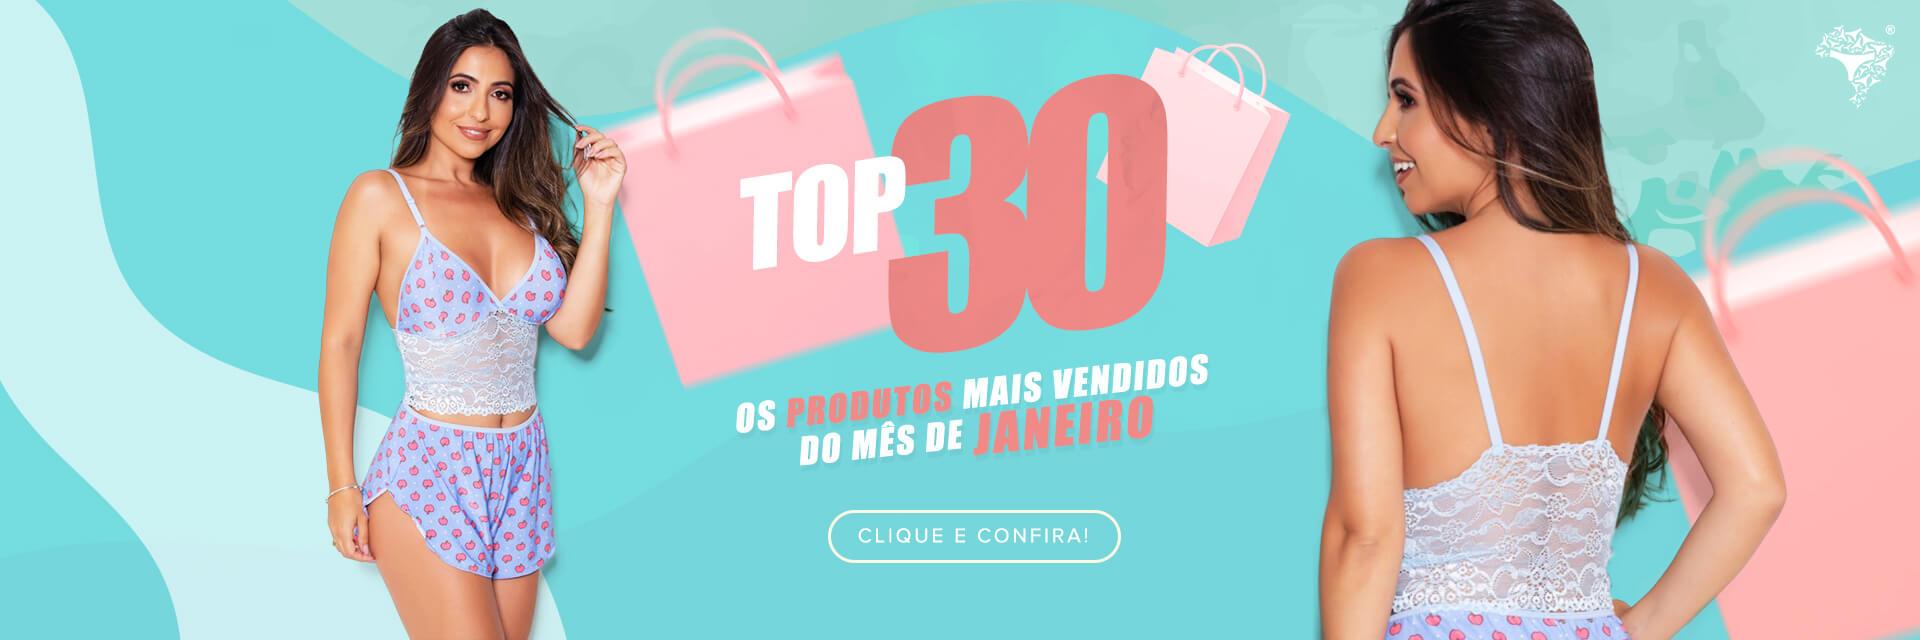 Top 30 Mais Vendidos Jan 2021